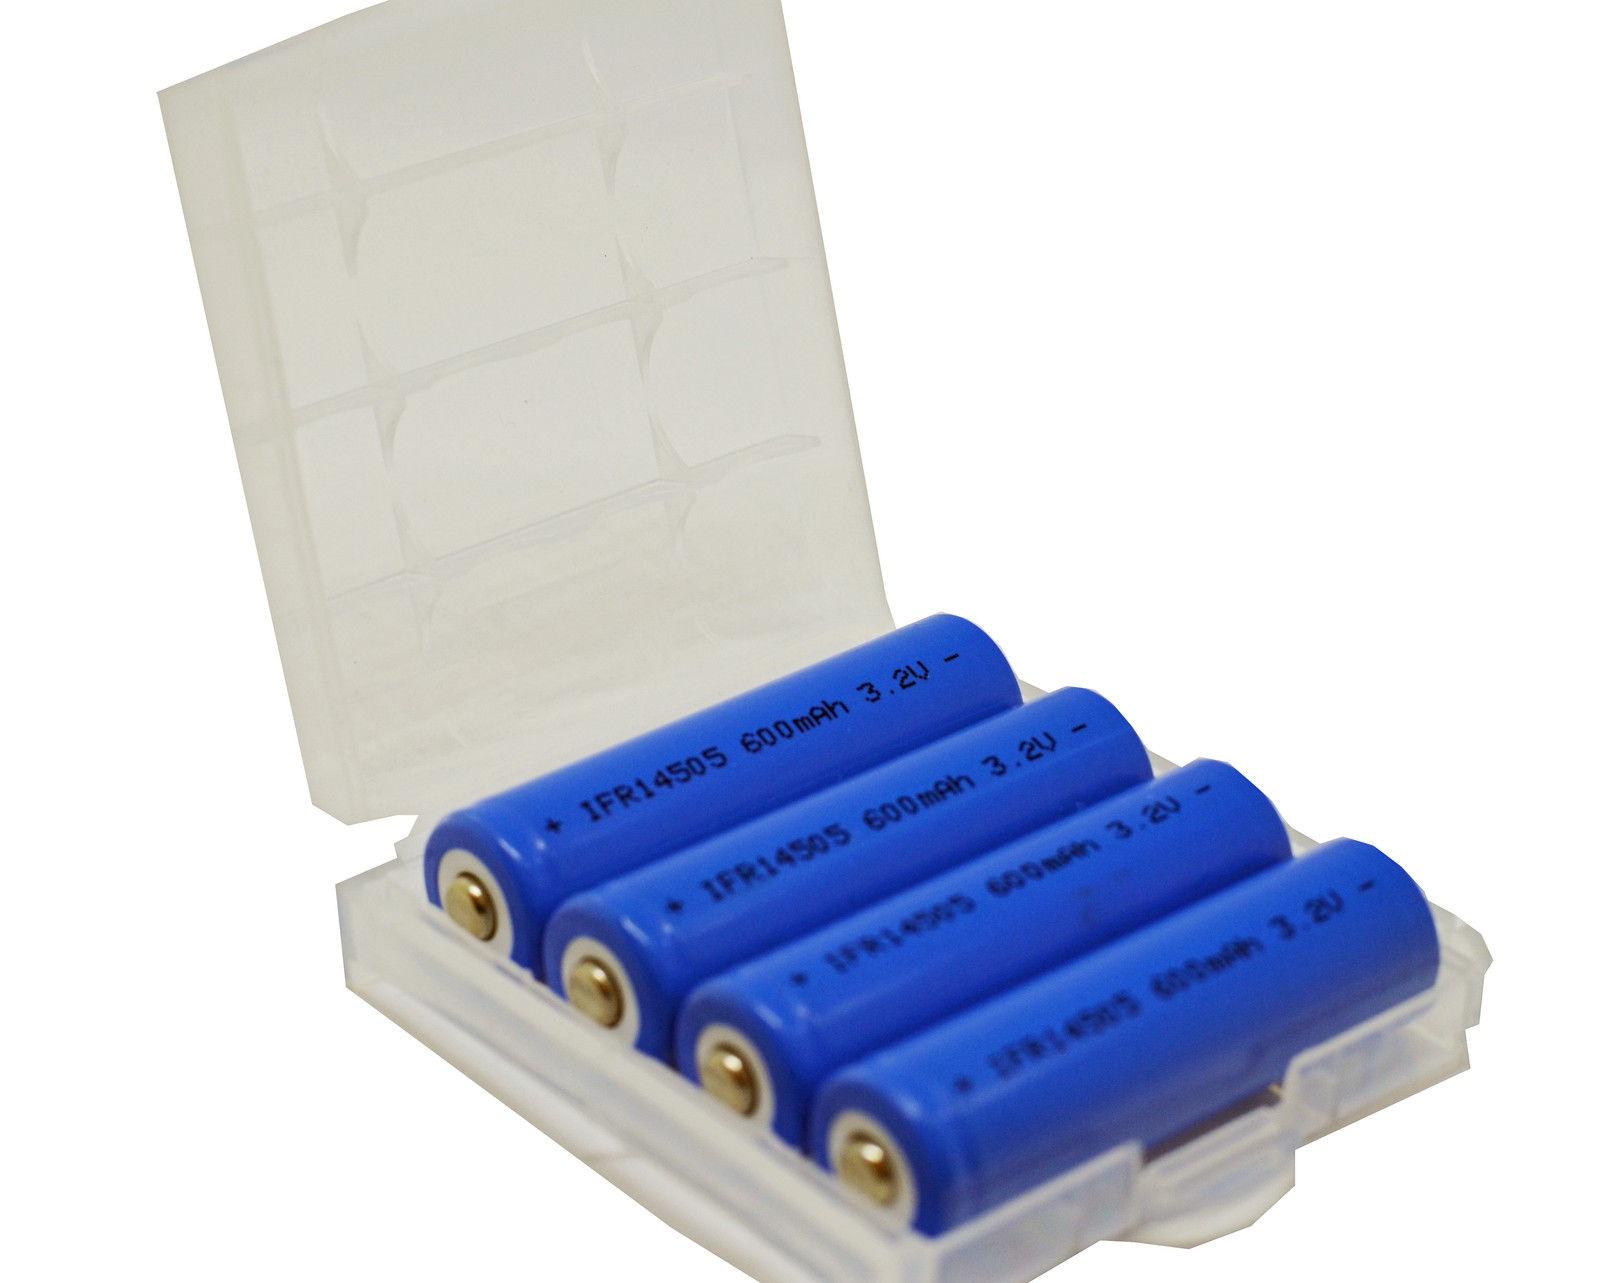 light pack for solar rechargeable aa com sunlabz aaa batteries efficient dp bedfordpower nicd amazon ultra